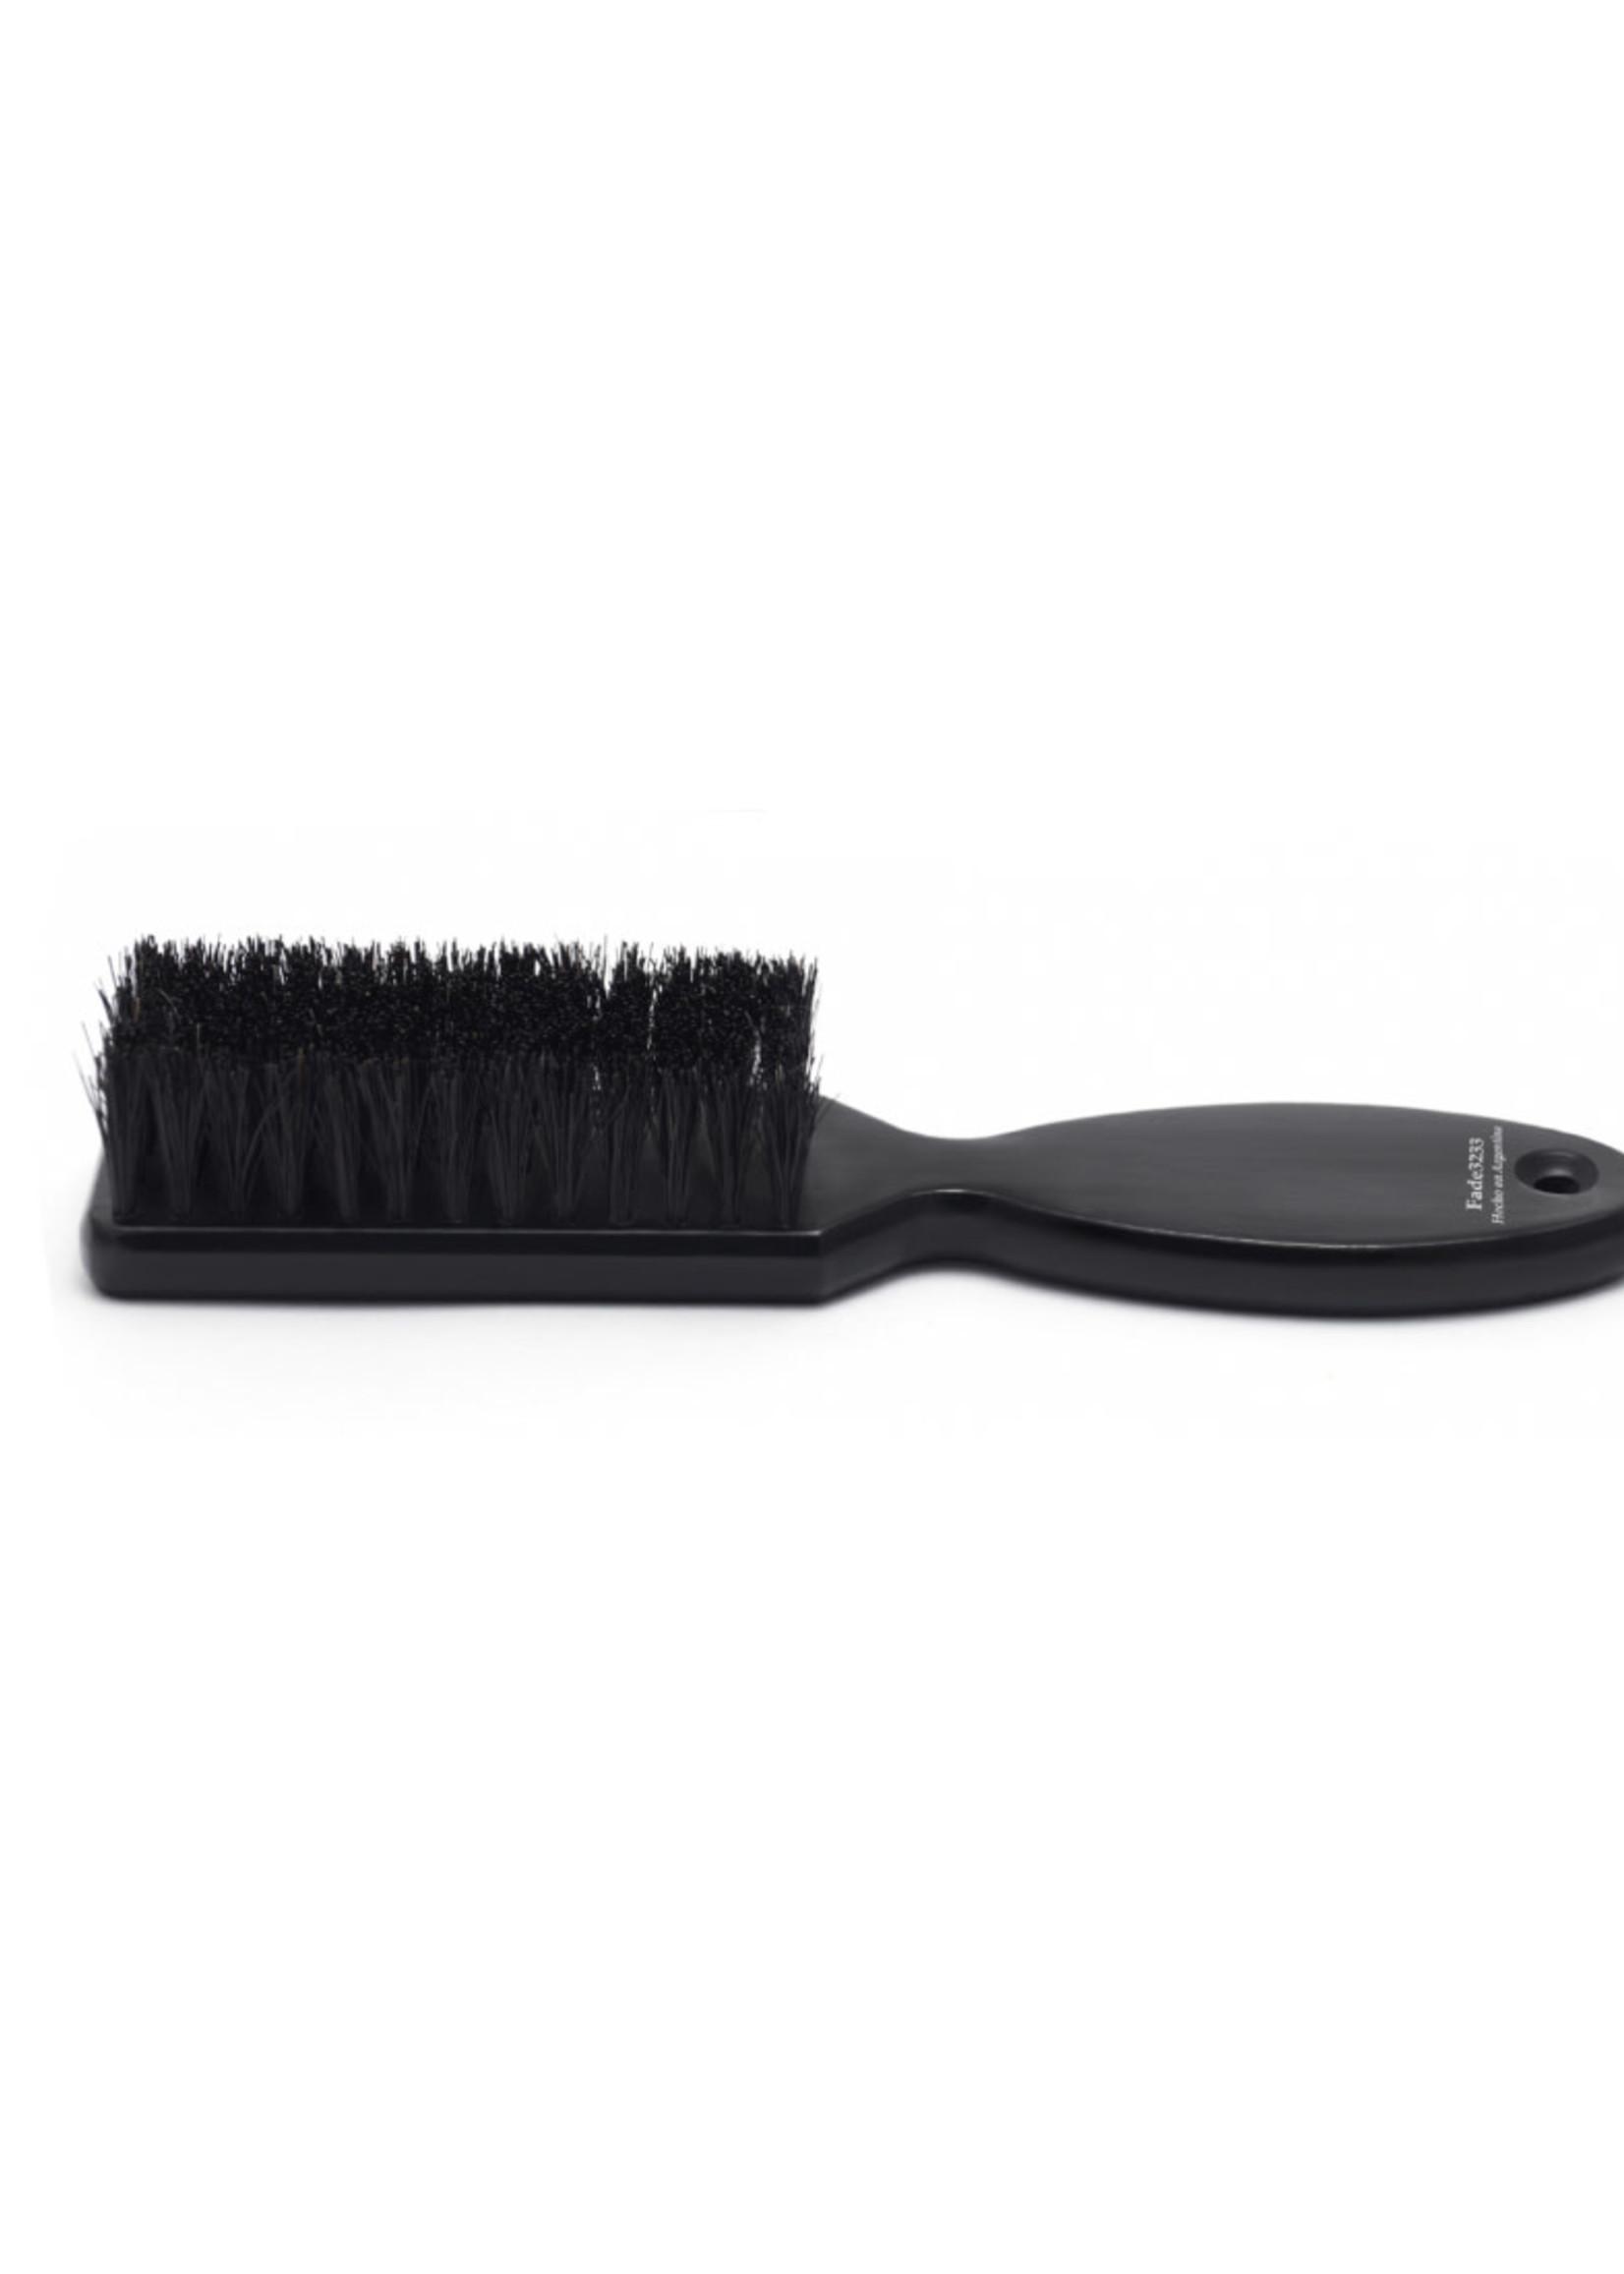 Gamma Plus Gamma+ Fade Barber Brush